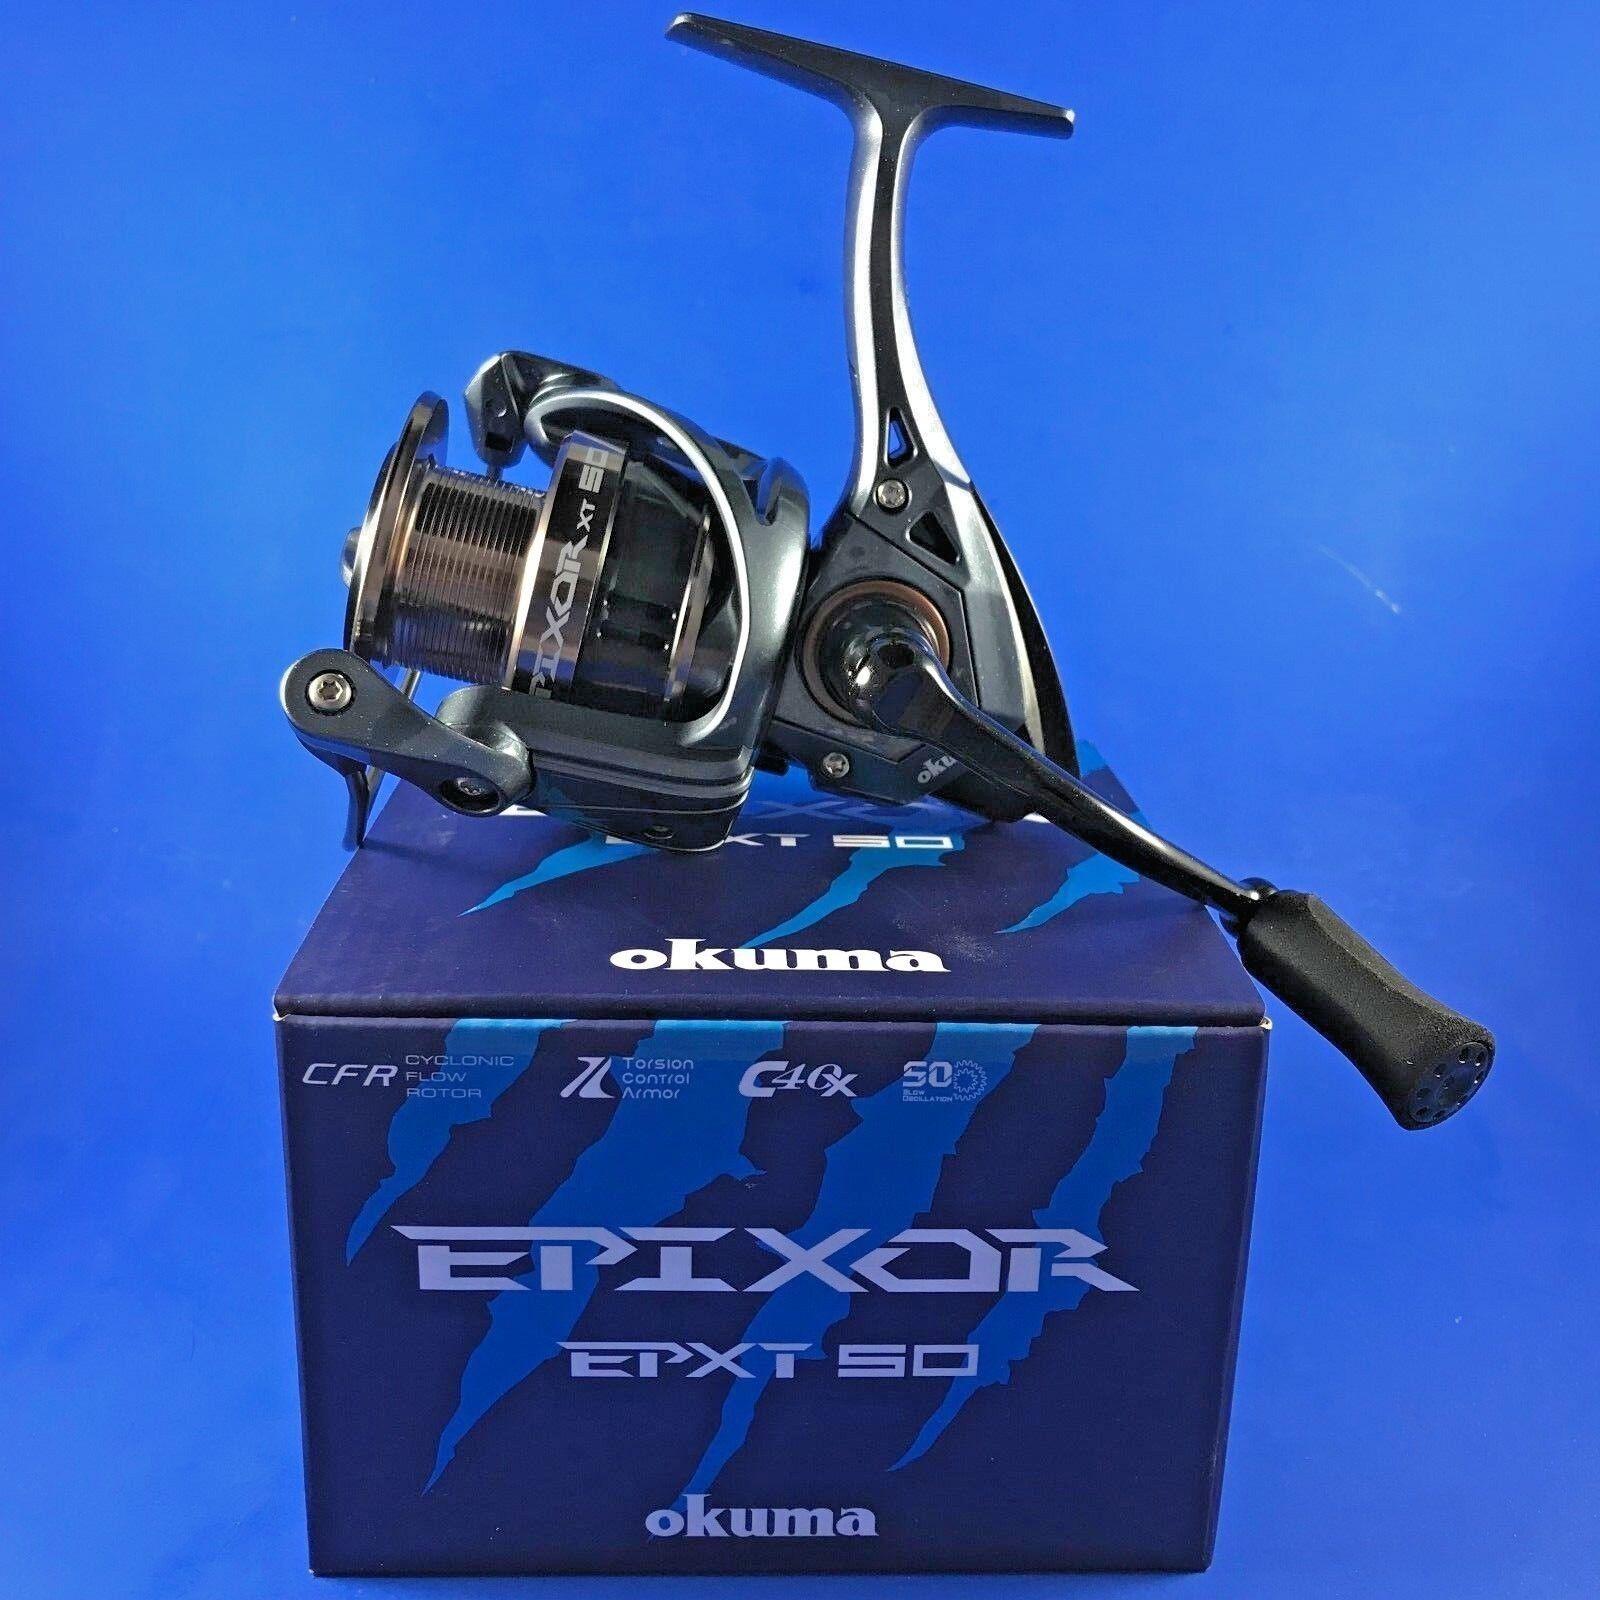 Okuma Epixor XT EPXT-50 FD 7+1BB 5.0 1 58610 Front Drag Fishing Reel